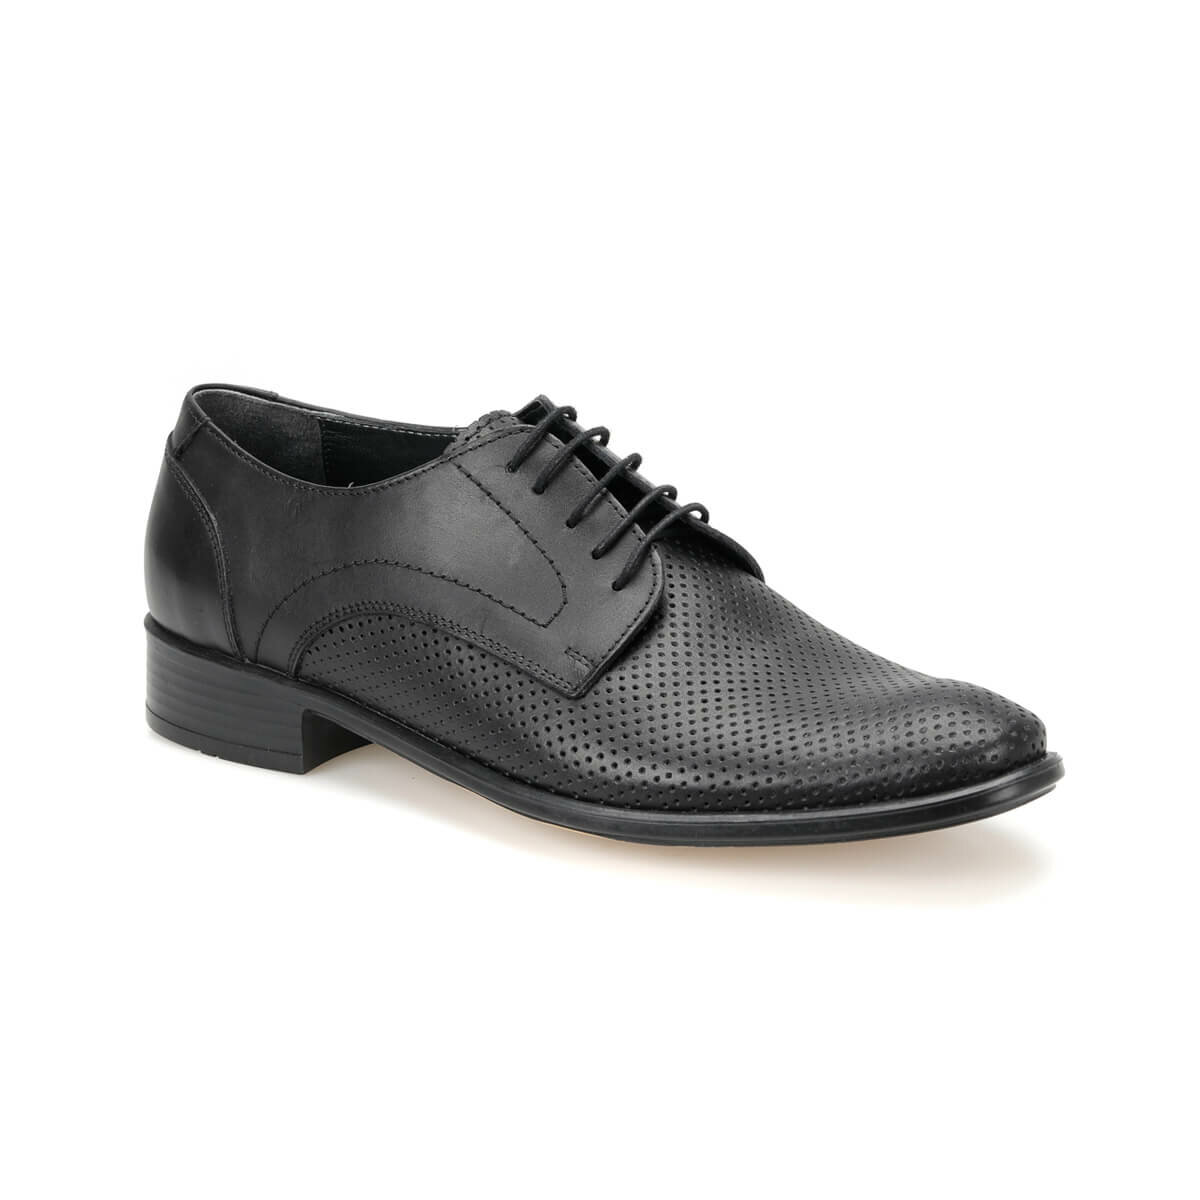 FLO GR-18 Black Men 'S Classic Shoes Garamond